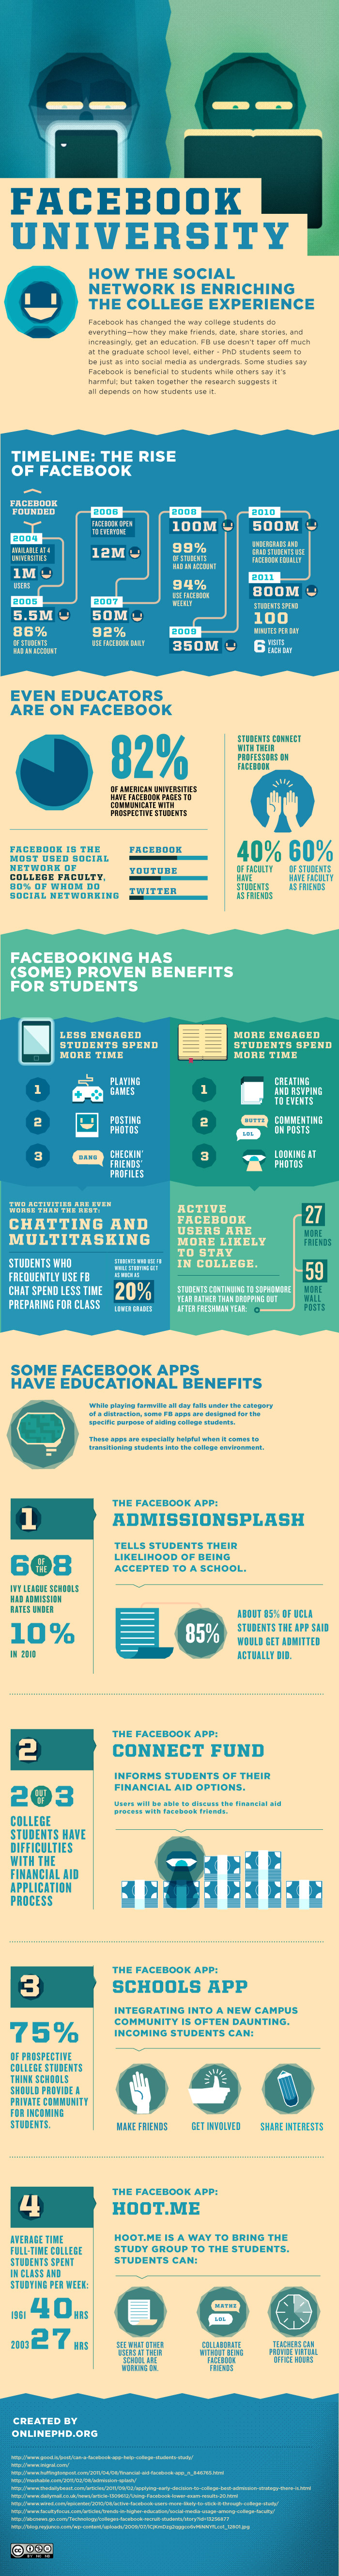 Infographic Facebook University